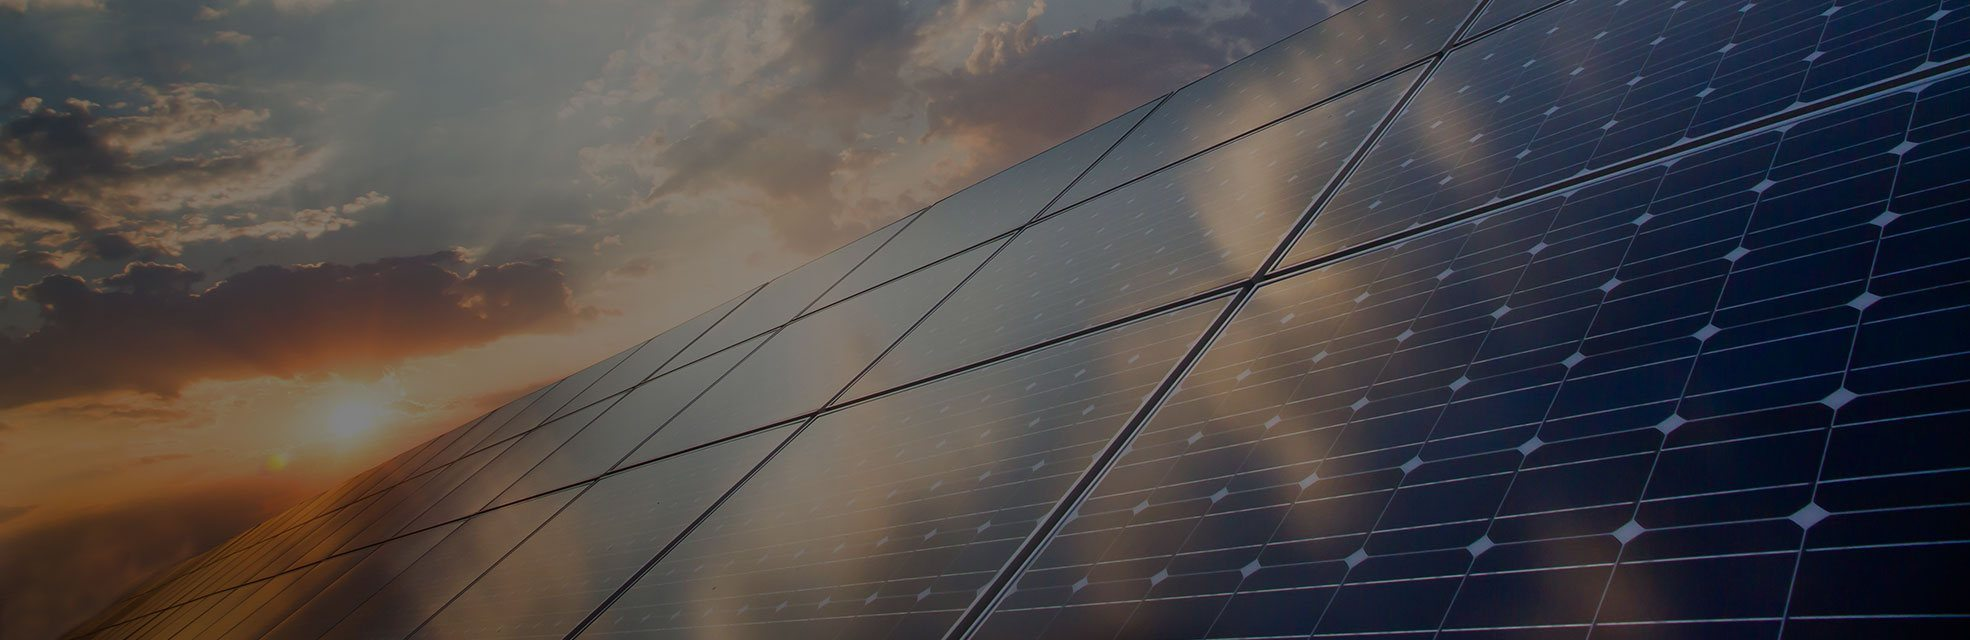 Solar & Energy Division        Leading Provider of Solar & Energy Solutions worldwide. Providing Solar PV Solutions: On-Grid, Off-grid & Hybrid.           Explore